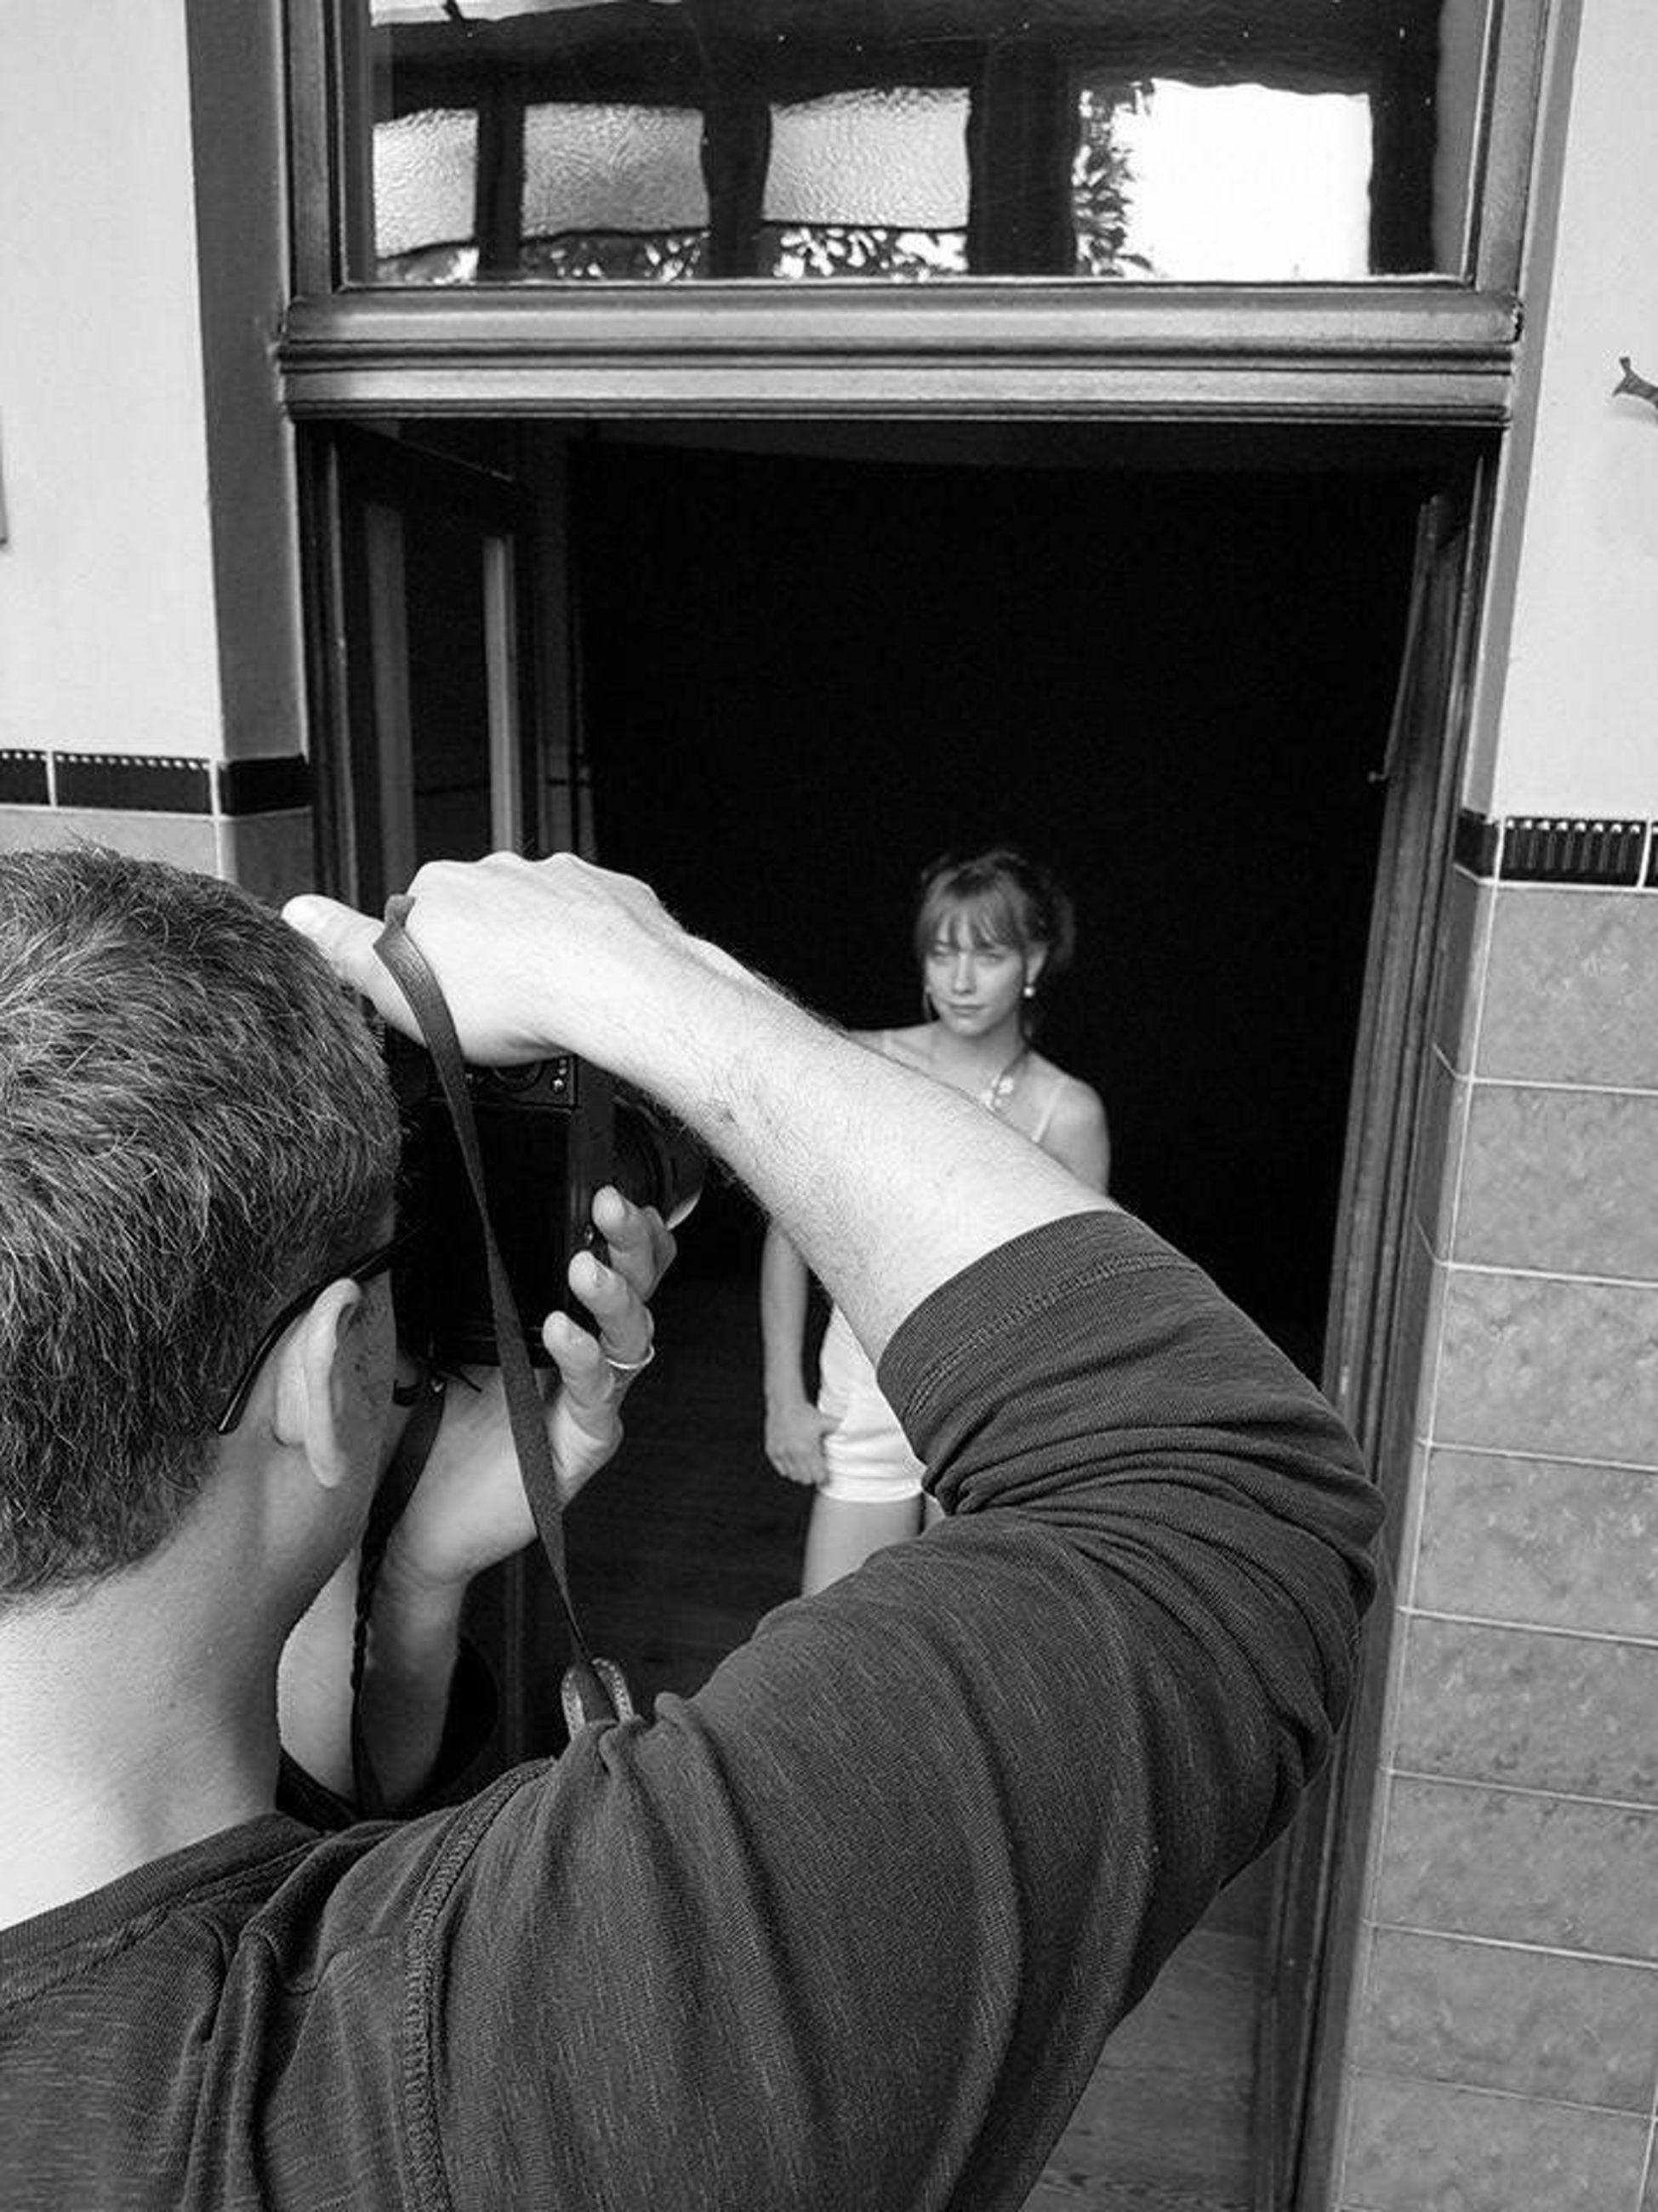 20527363_1500061876721026_1567024880_n_Exp Fotografie Workshop Bonn Portraitfotografie_Fotografie Workshop Bonn.jpg